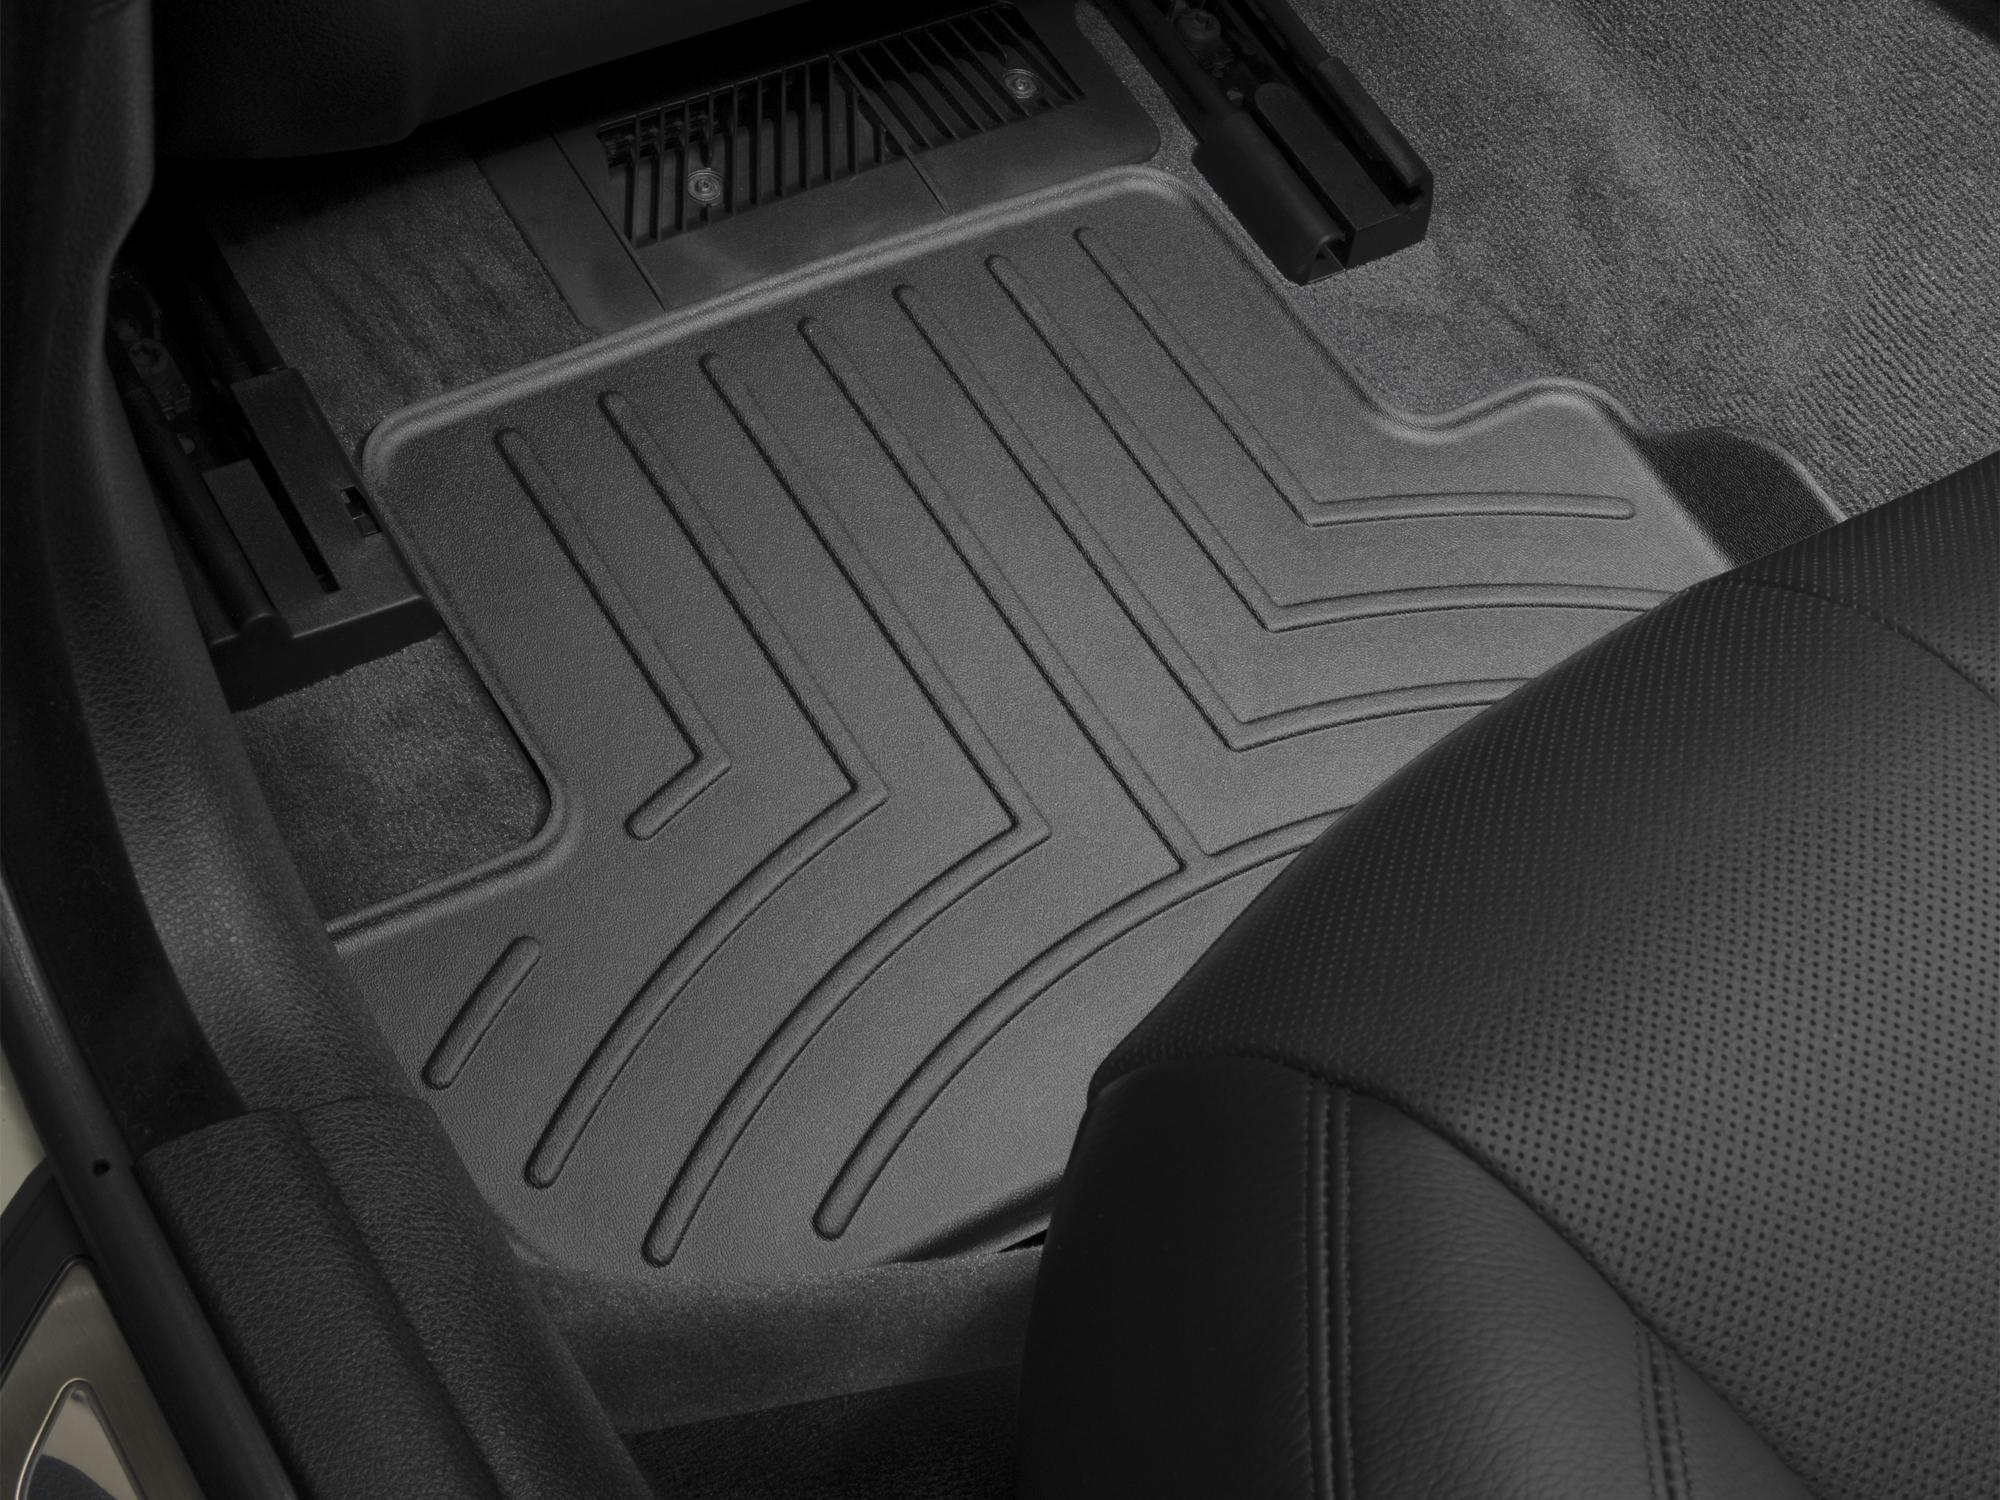 Trc Tuning Corporations Germany E K Toyota Lexus Mazda Tesla Tuning Developments Trc Performance Weathertech Fussmatten Bmw M6 F12 F13 F06 Schwarz